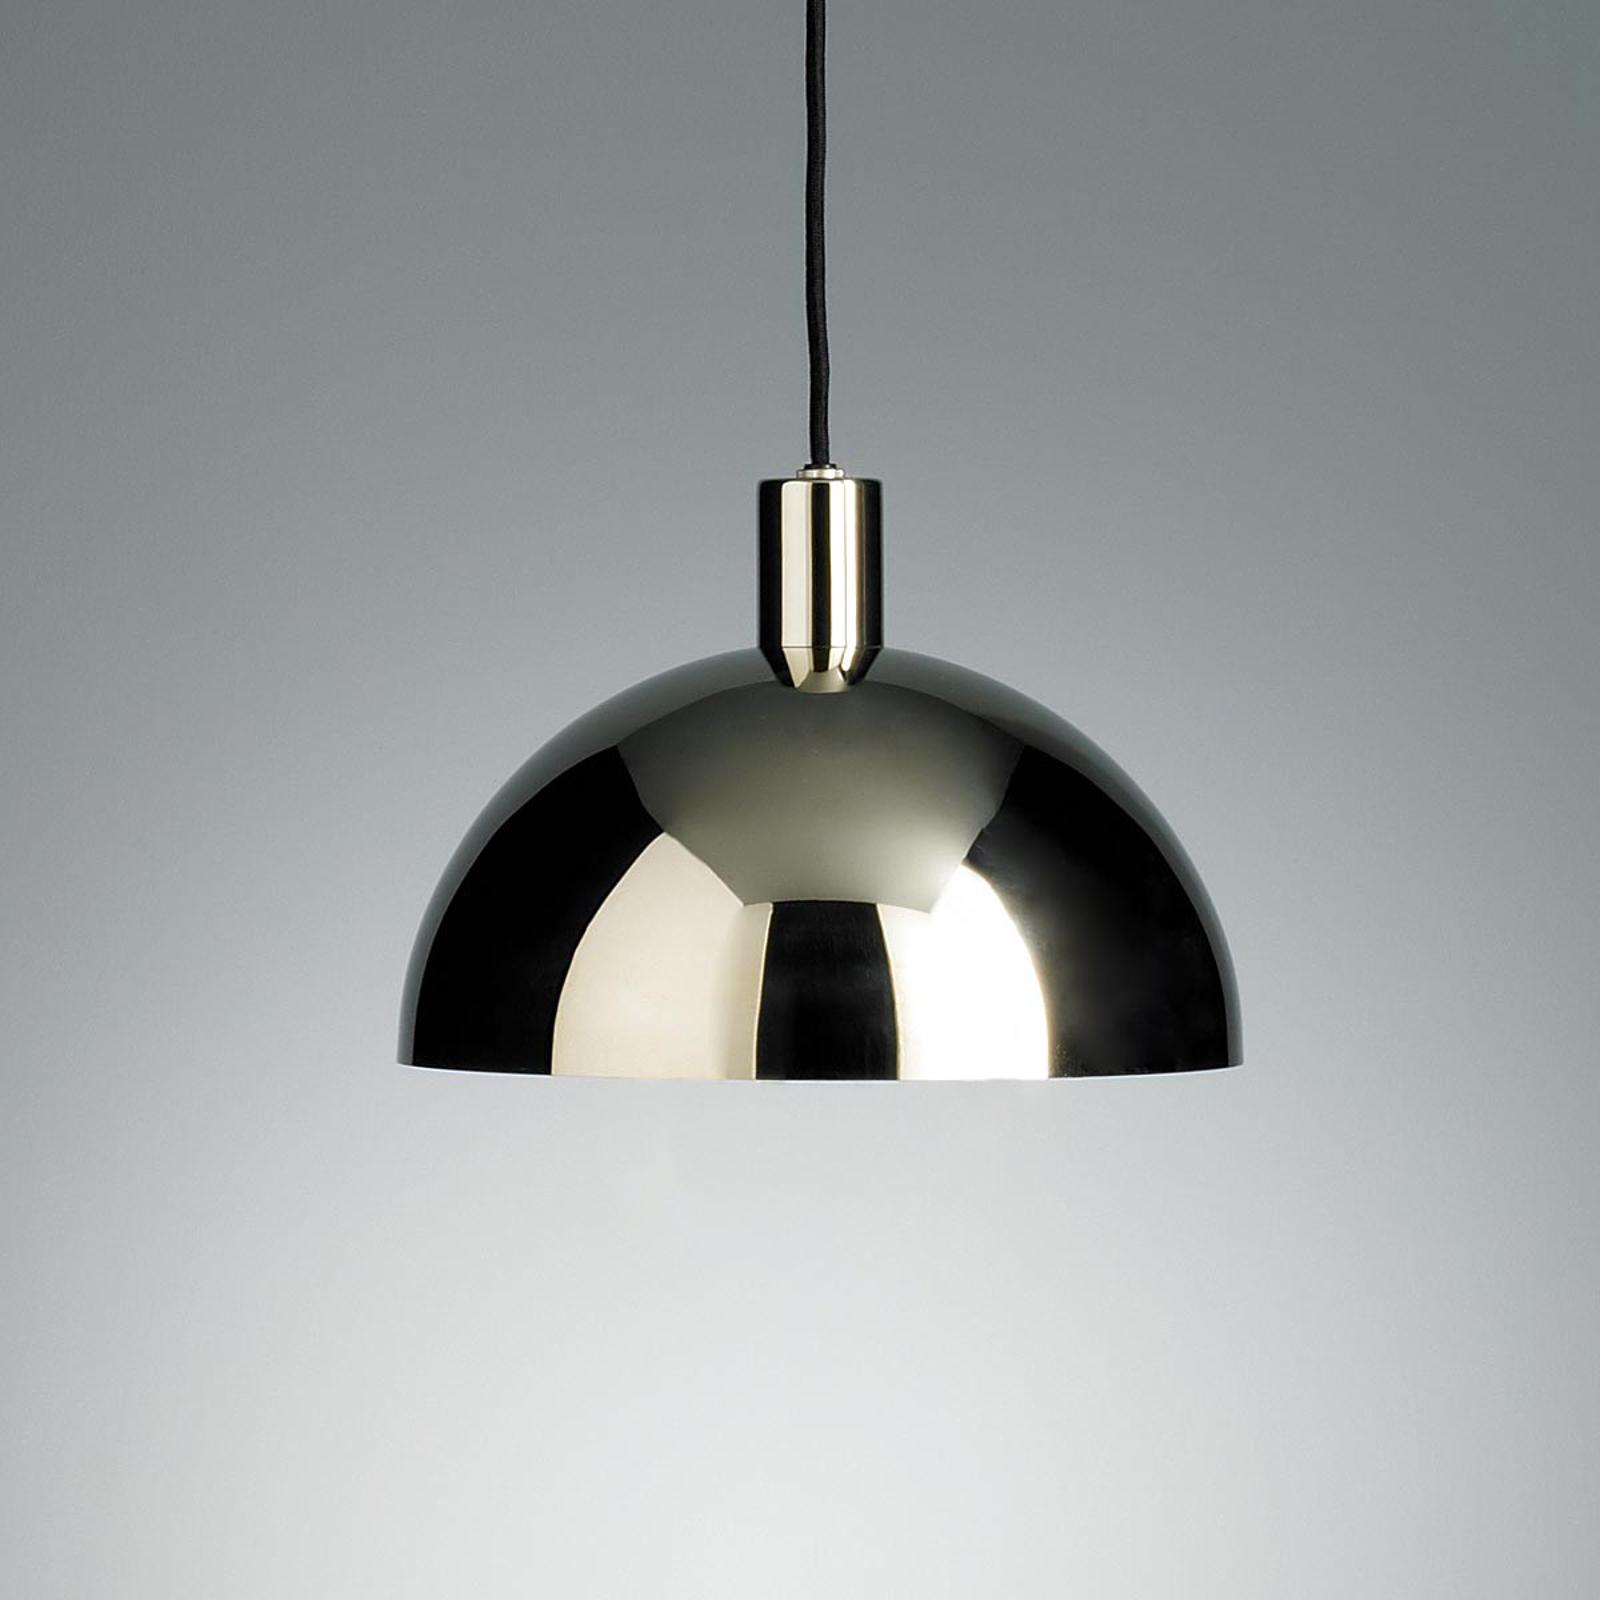 TECNOLUMEN HMB25 hanglamp zilver